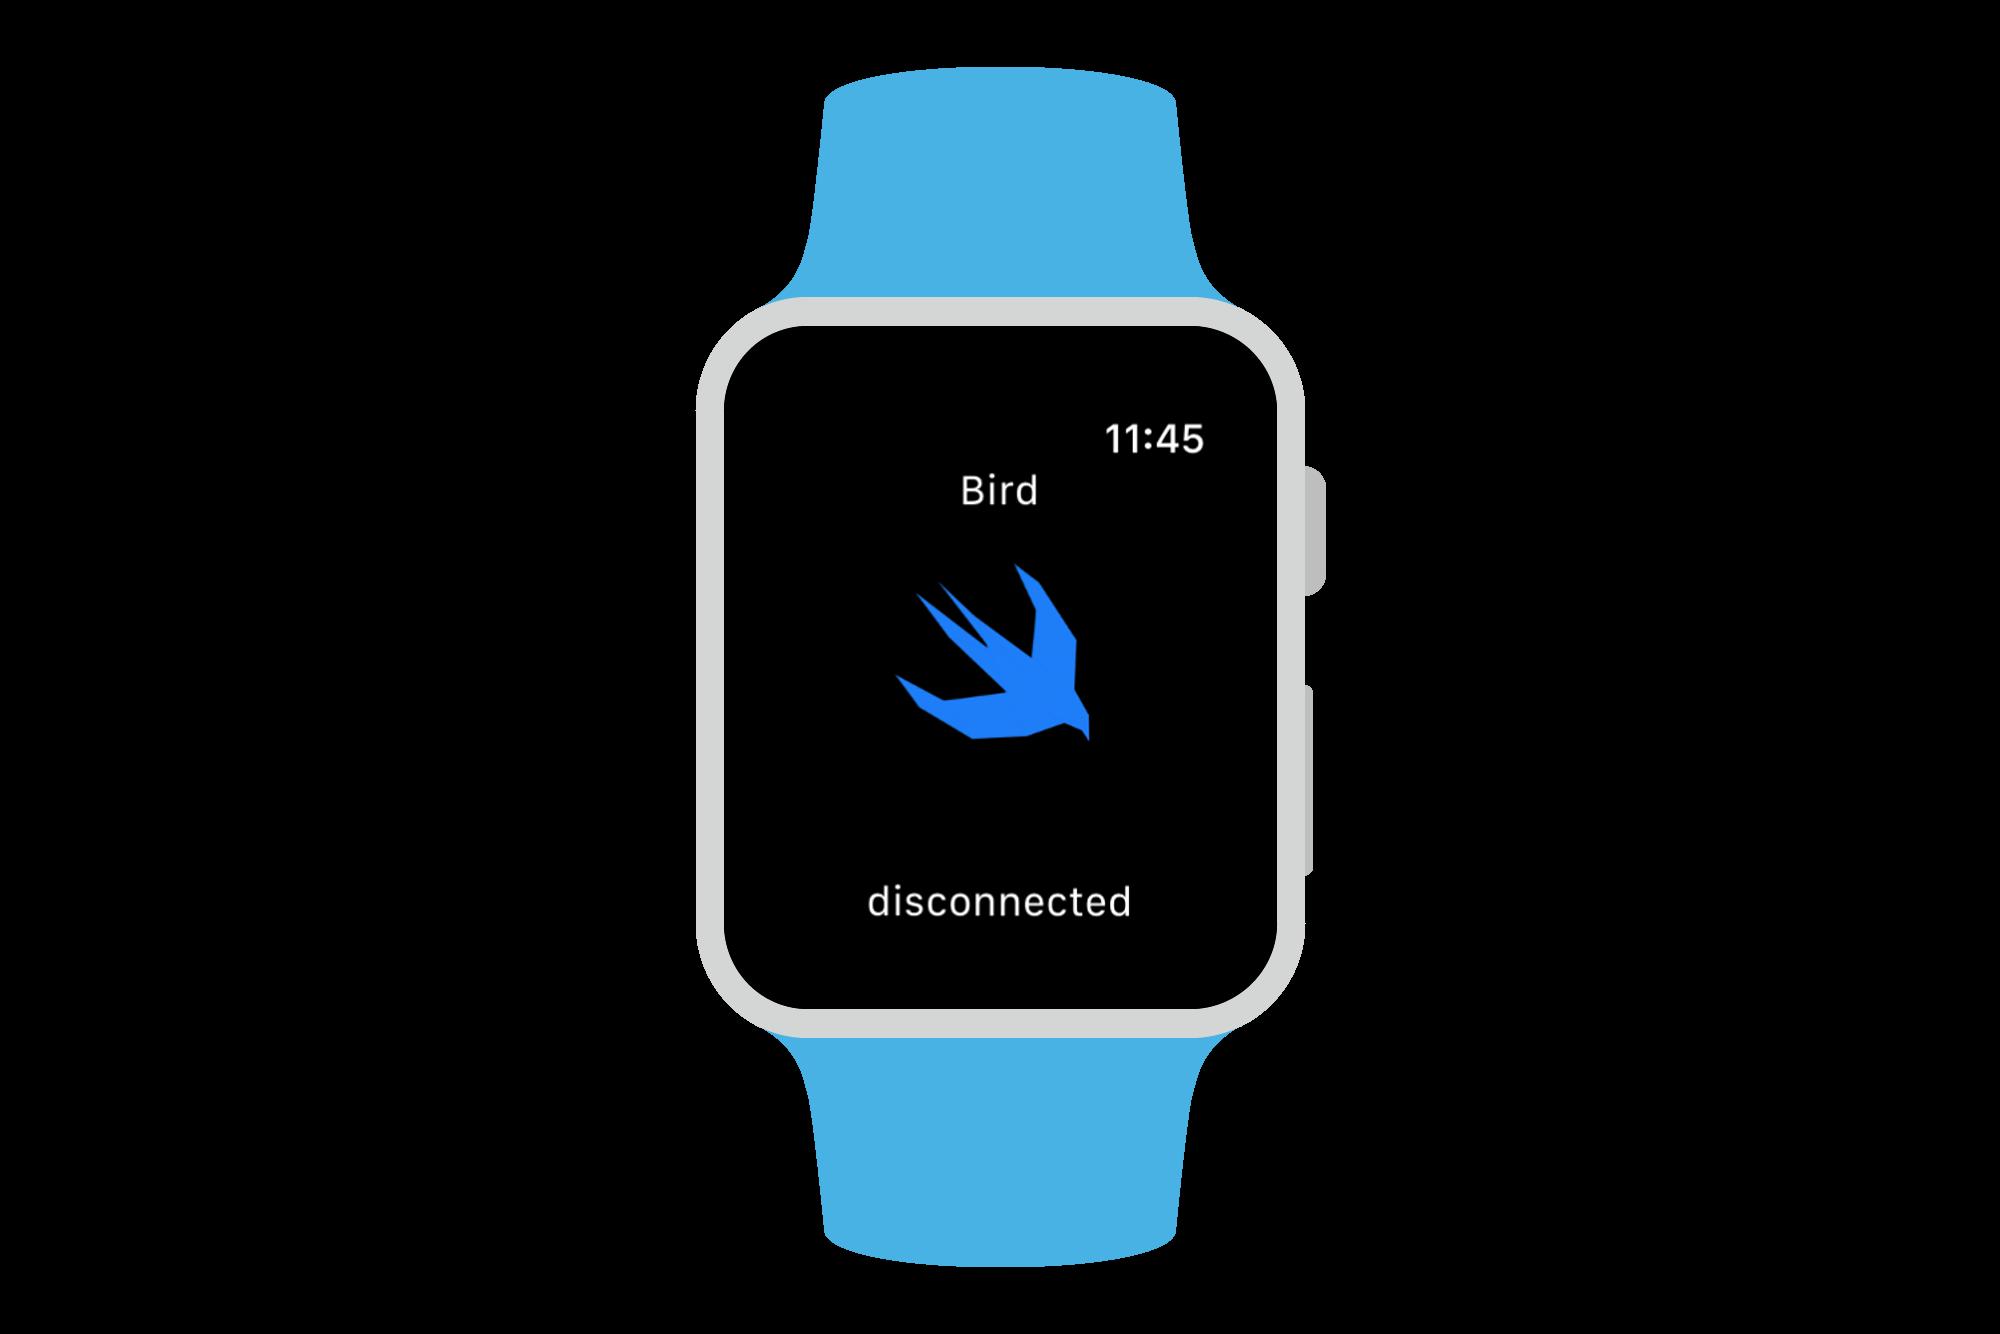 44 Watch your Bluetooth! – swifting io